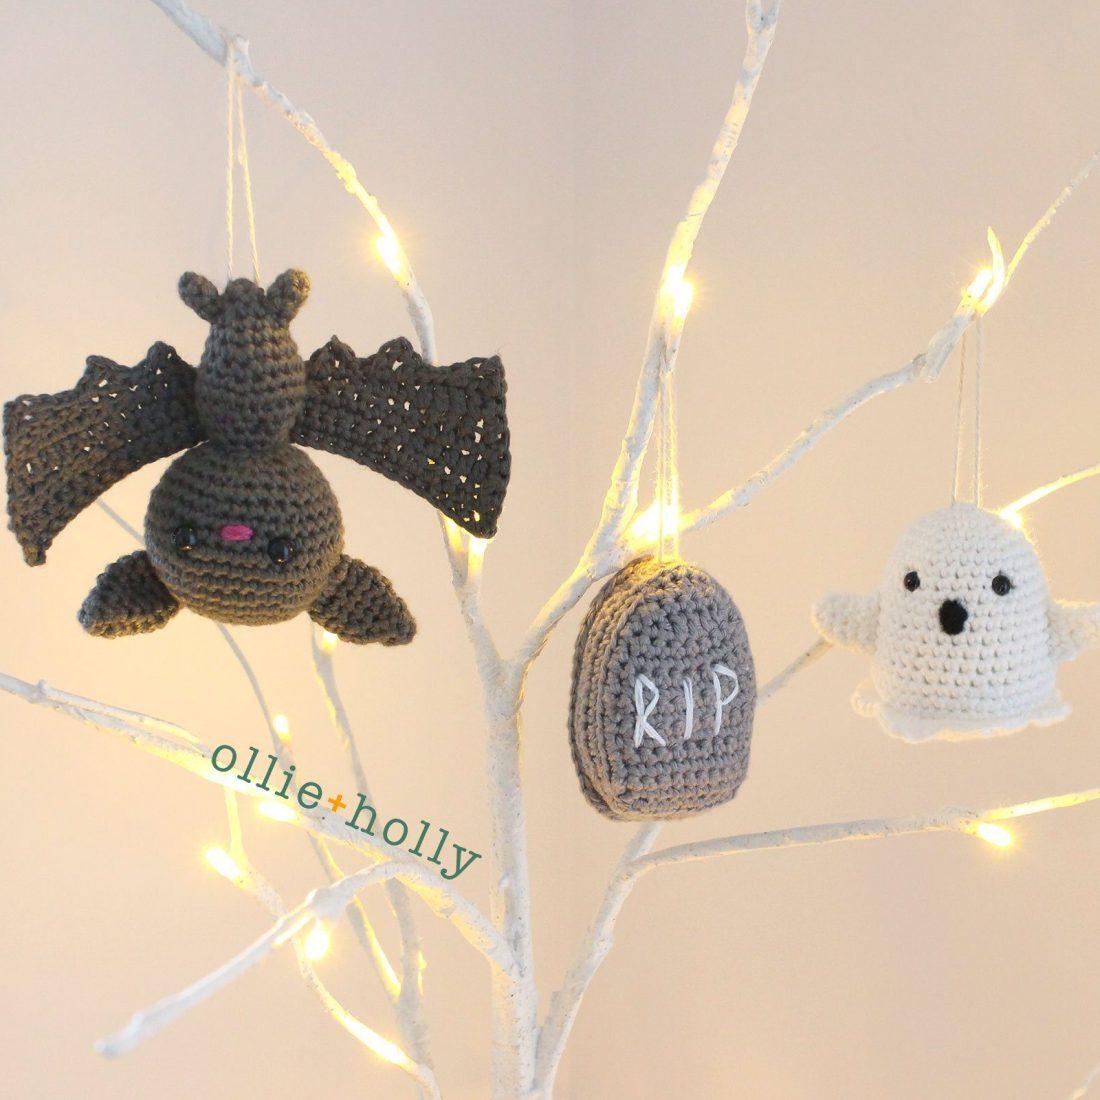 Graveyard Amigurumi Crochet Ornaments (Pattern Collection)